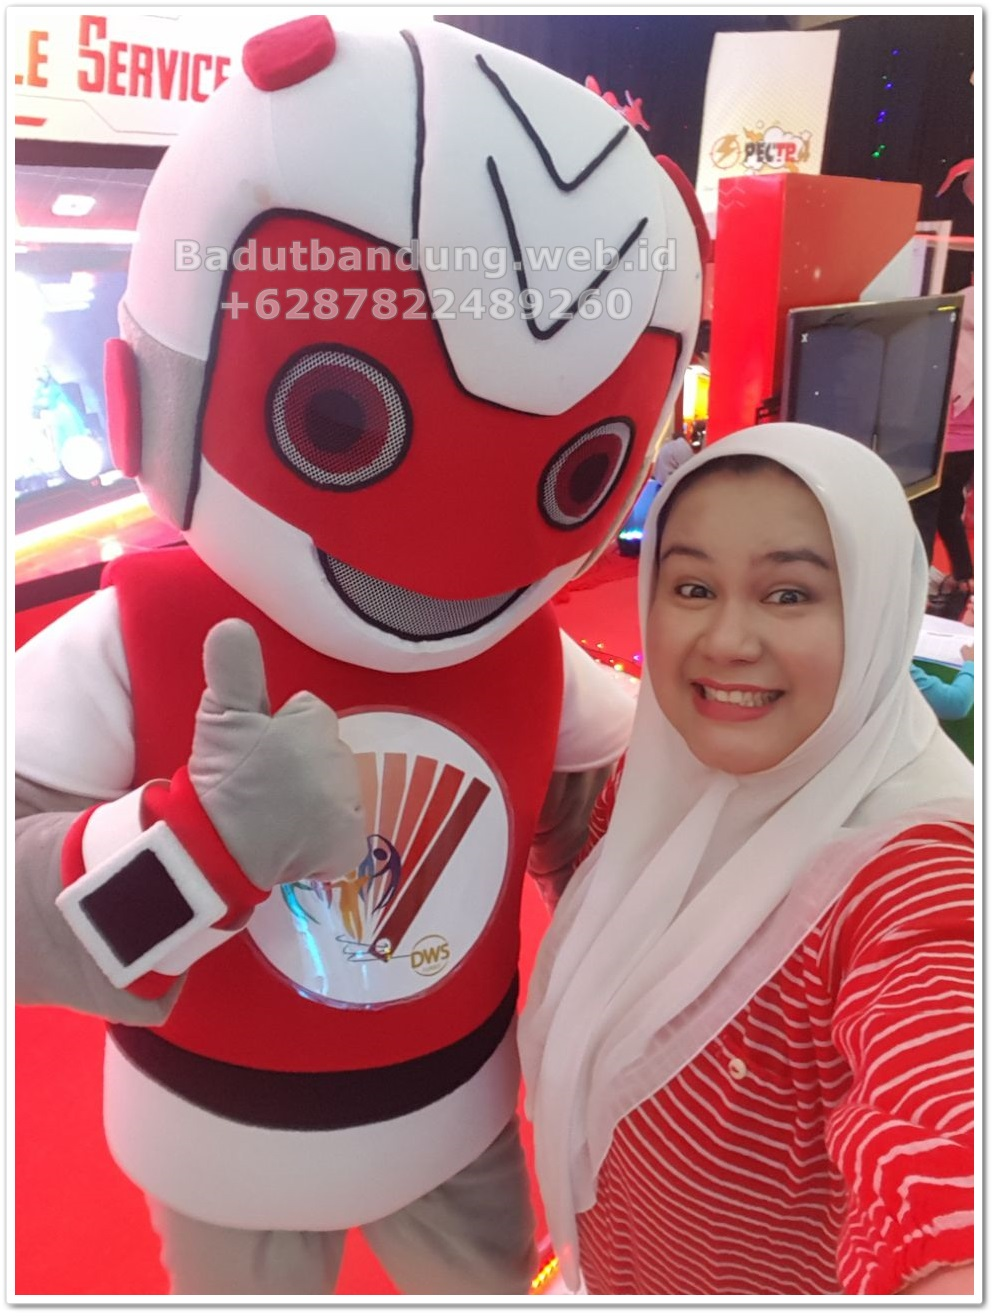 foto-event-kostum-badut-robot-maskot-bersama-client4